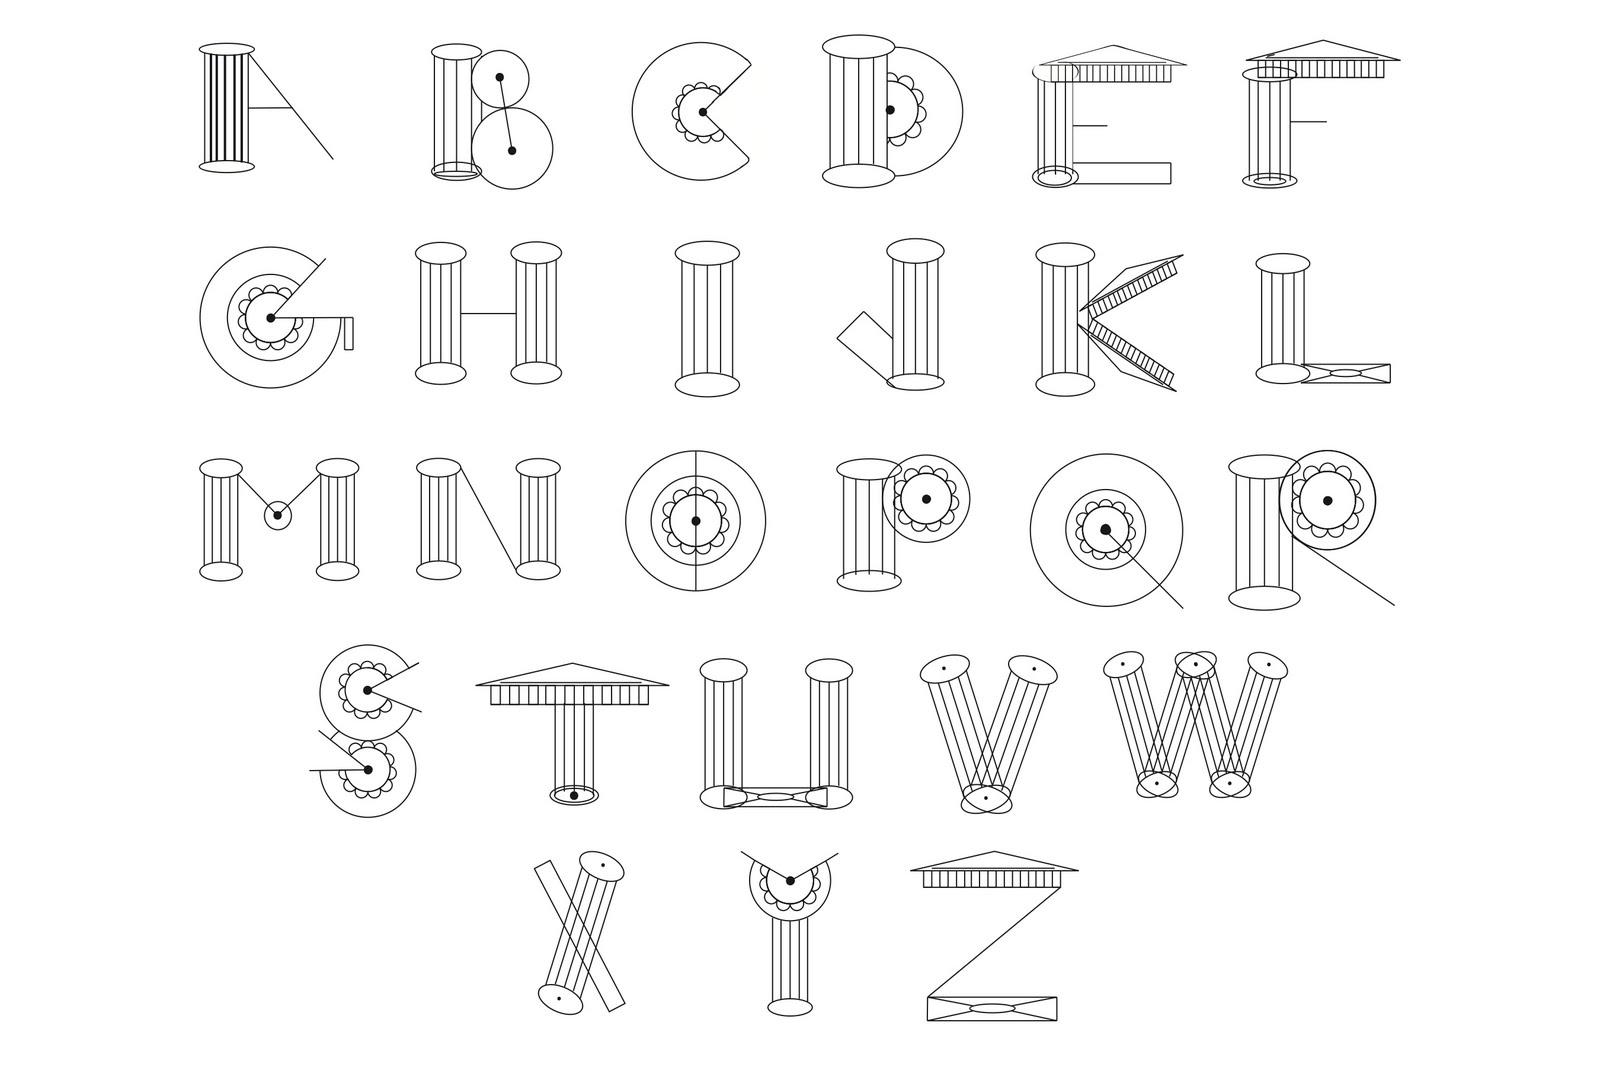 tikkit: Architectural Alphabets